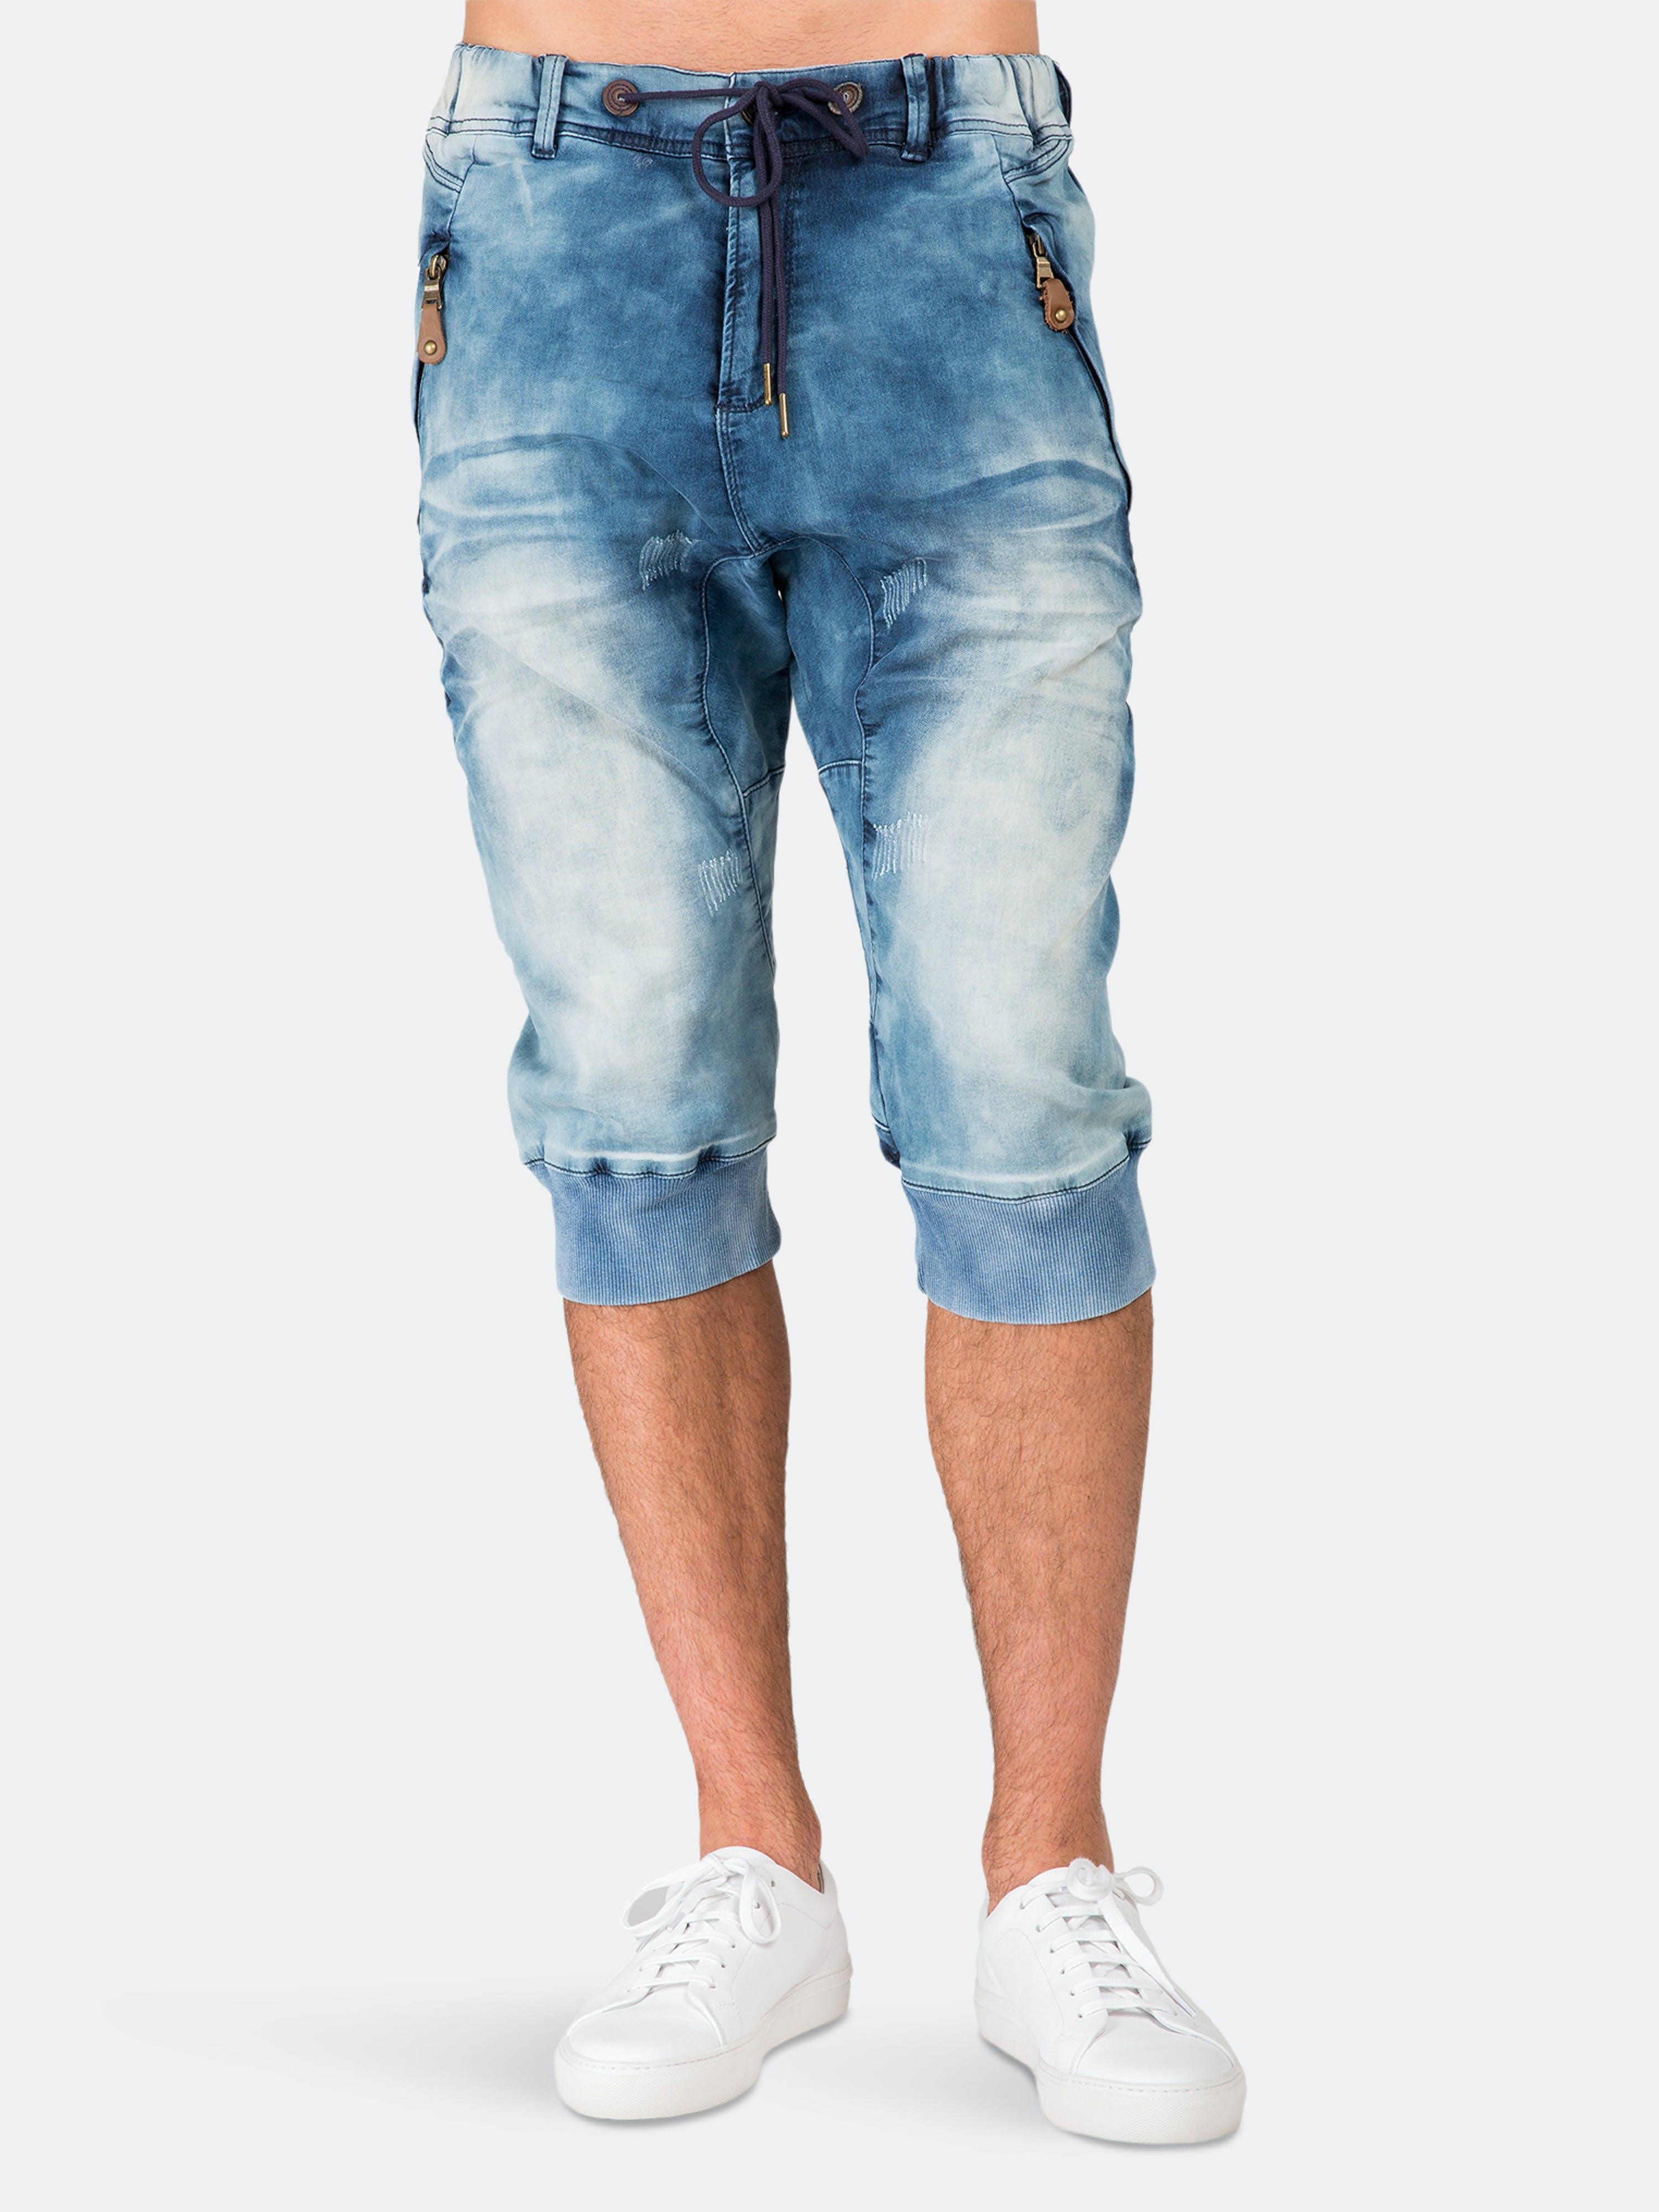 Level 7 Premium Jogger Capri Knit Denim Shorts Medium Clouded Blue